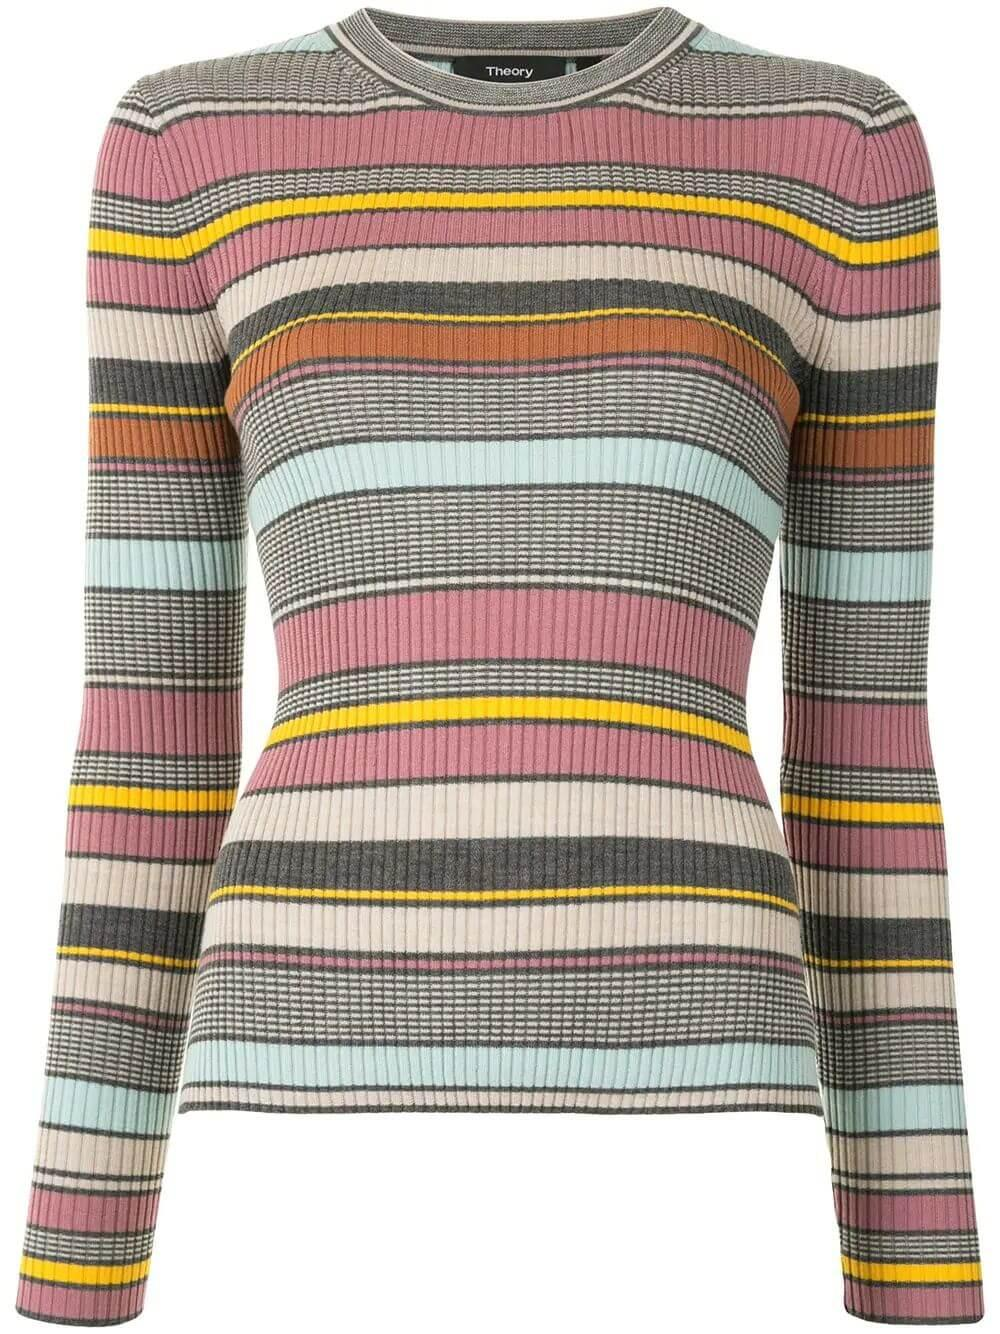 Regal Stripe Sweater Item # K0811715